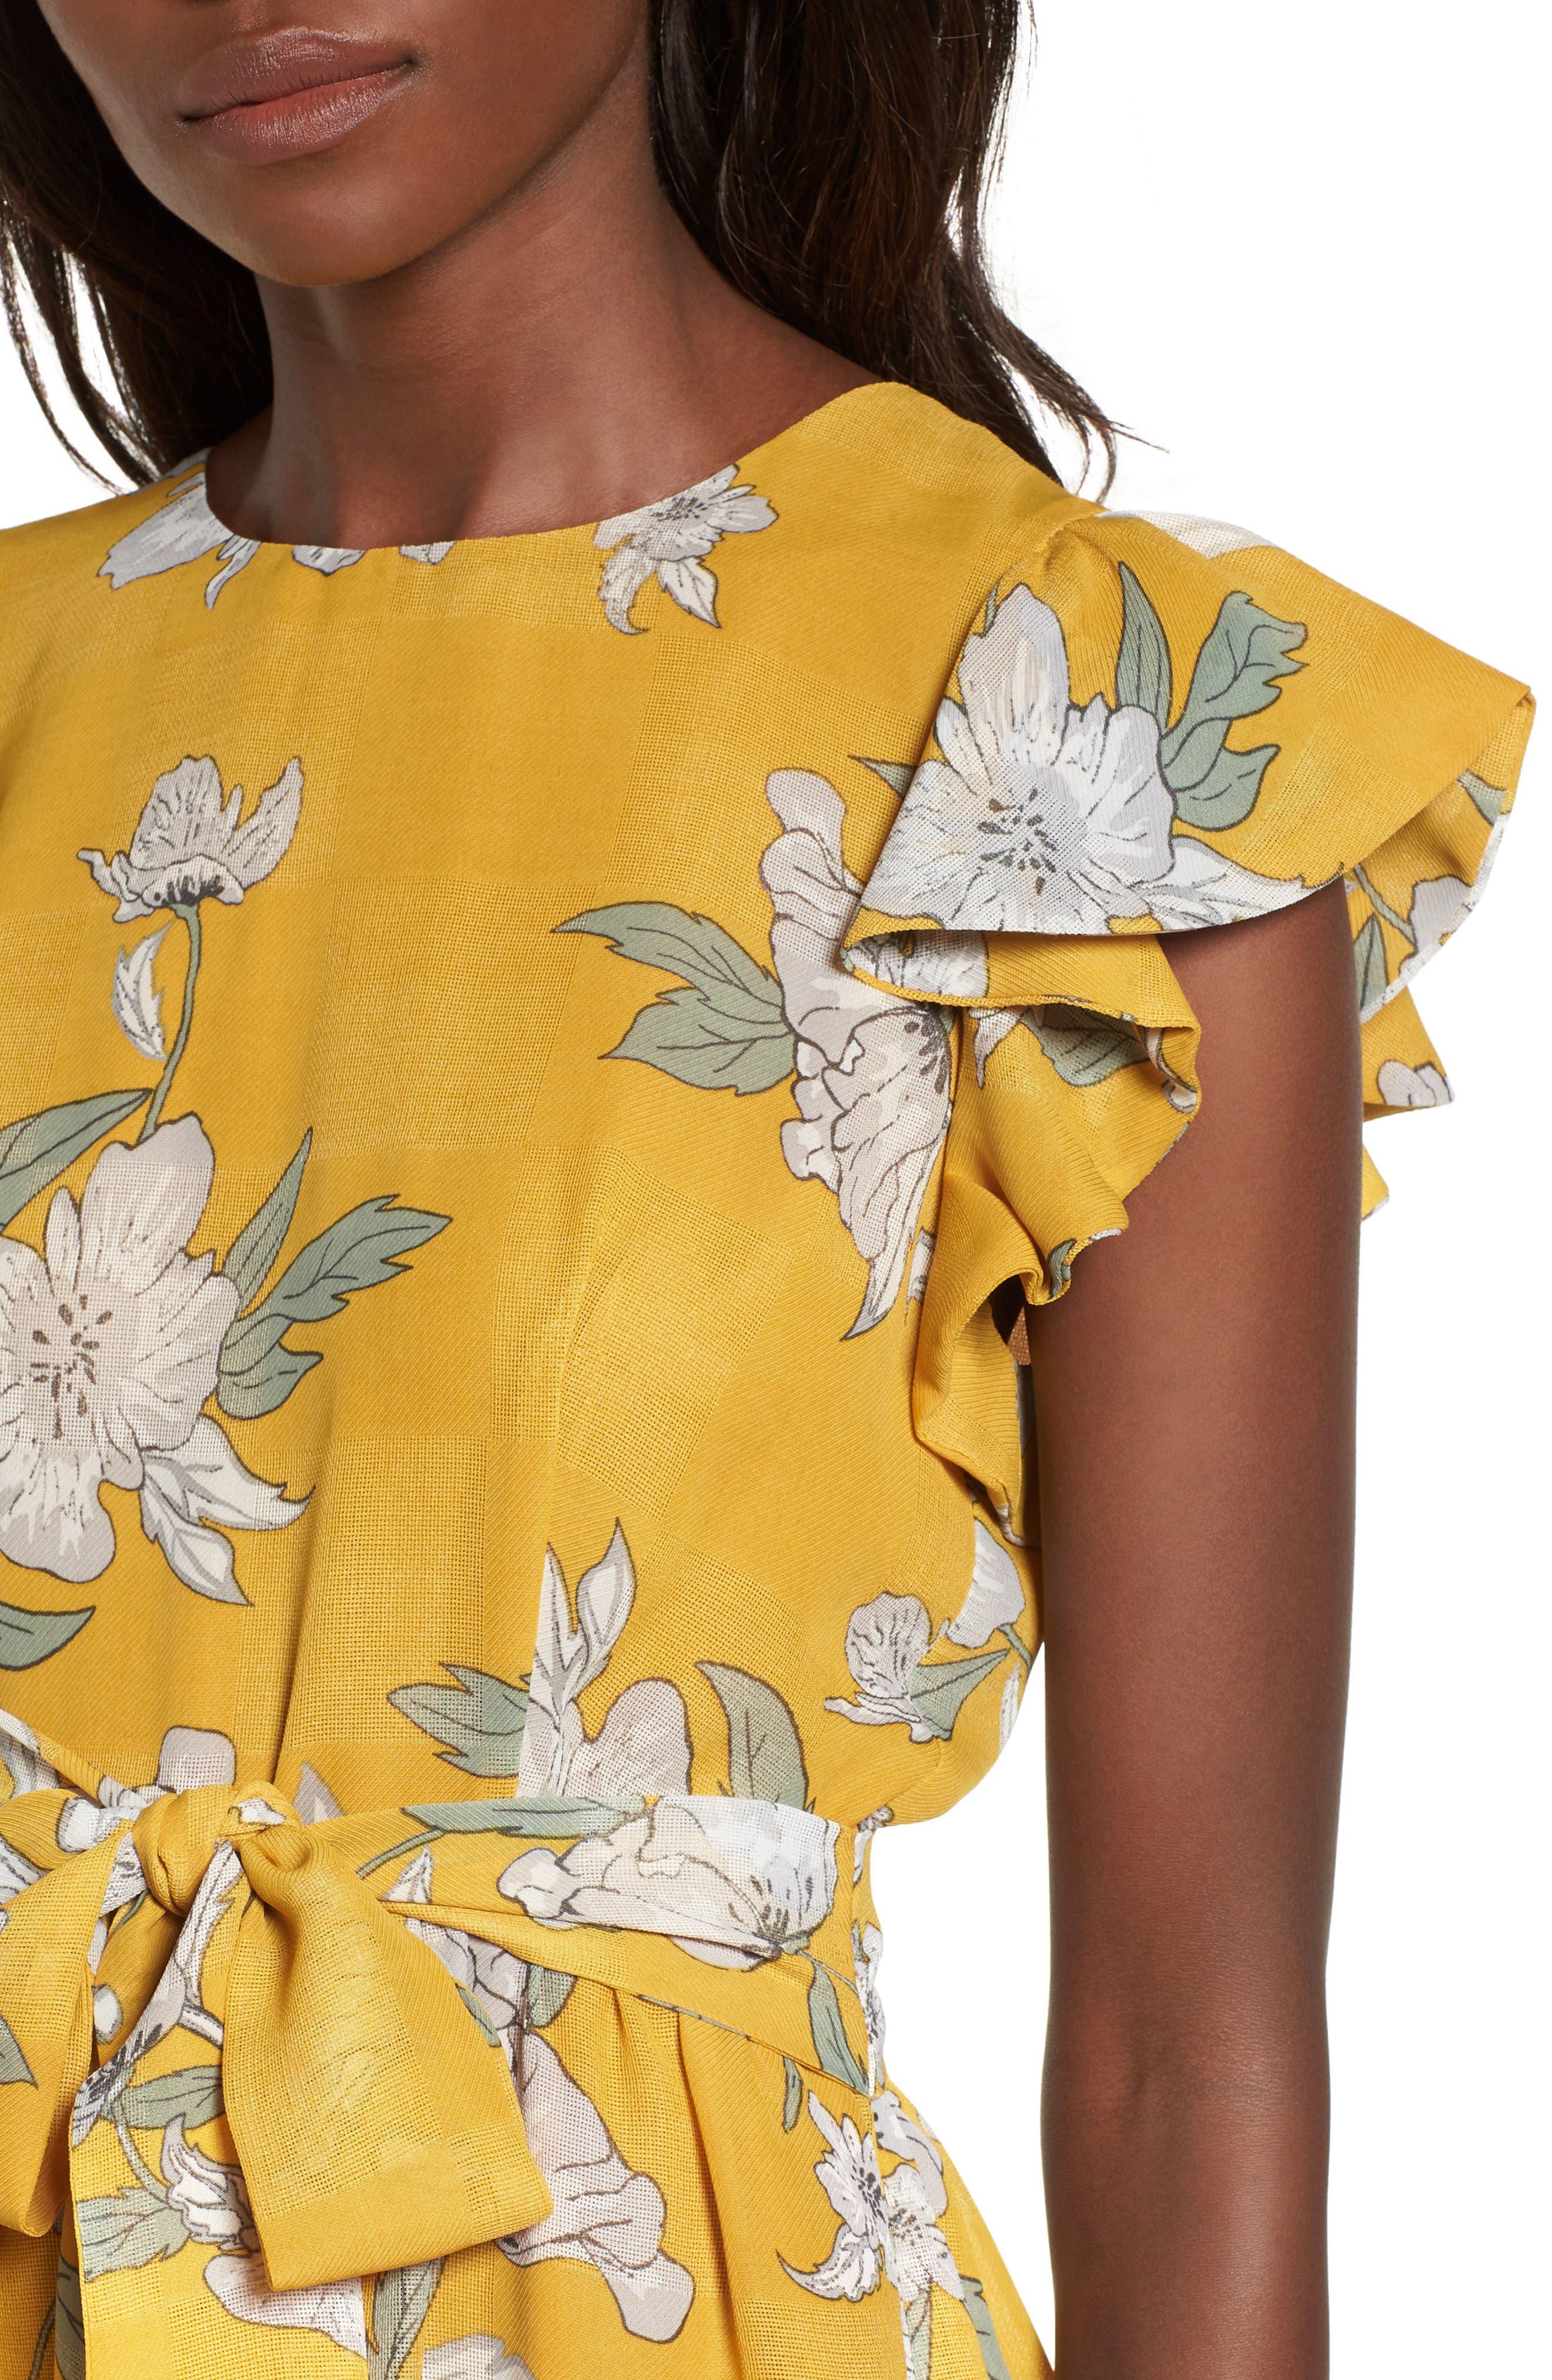 Chriselle x J.O.A. Fit & Flare Dress,                             Alternate thumbnail 4, color,                             700